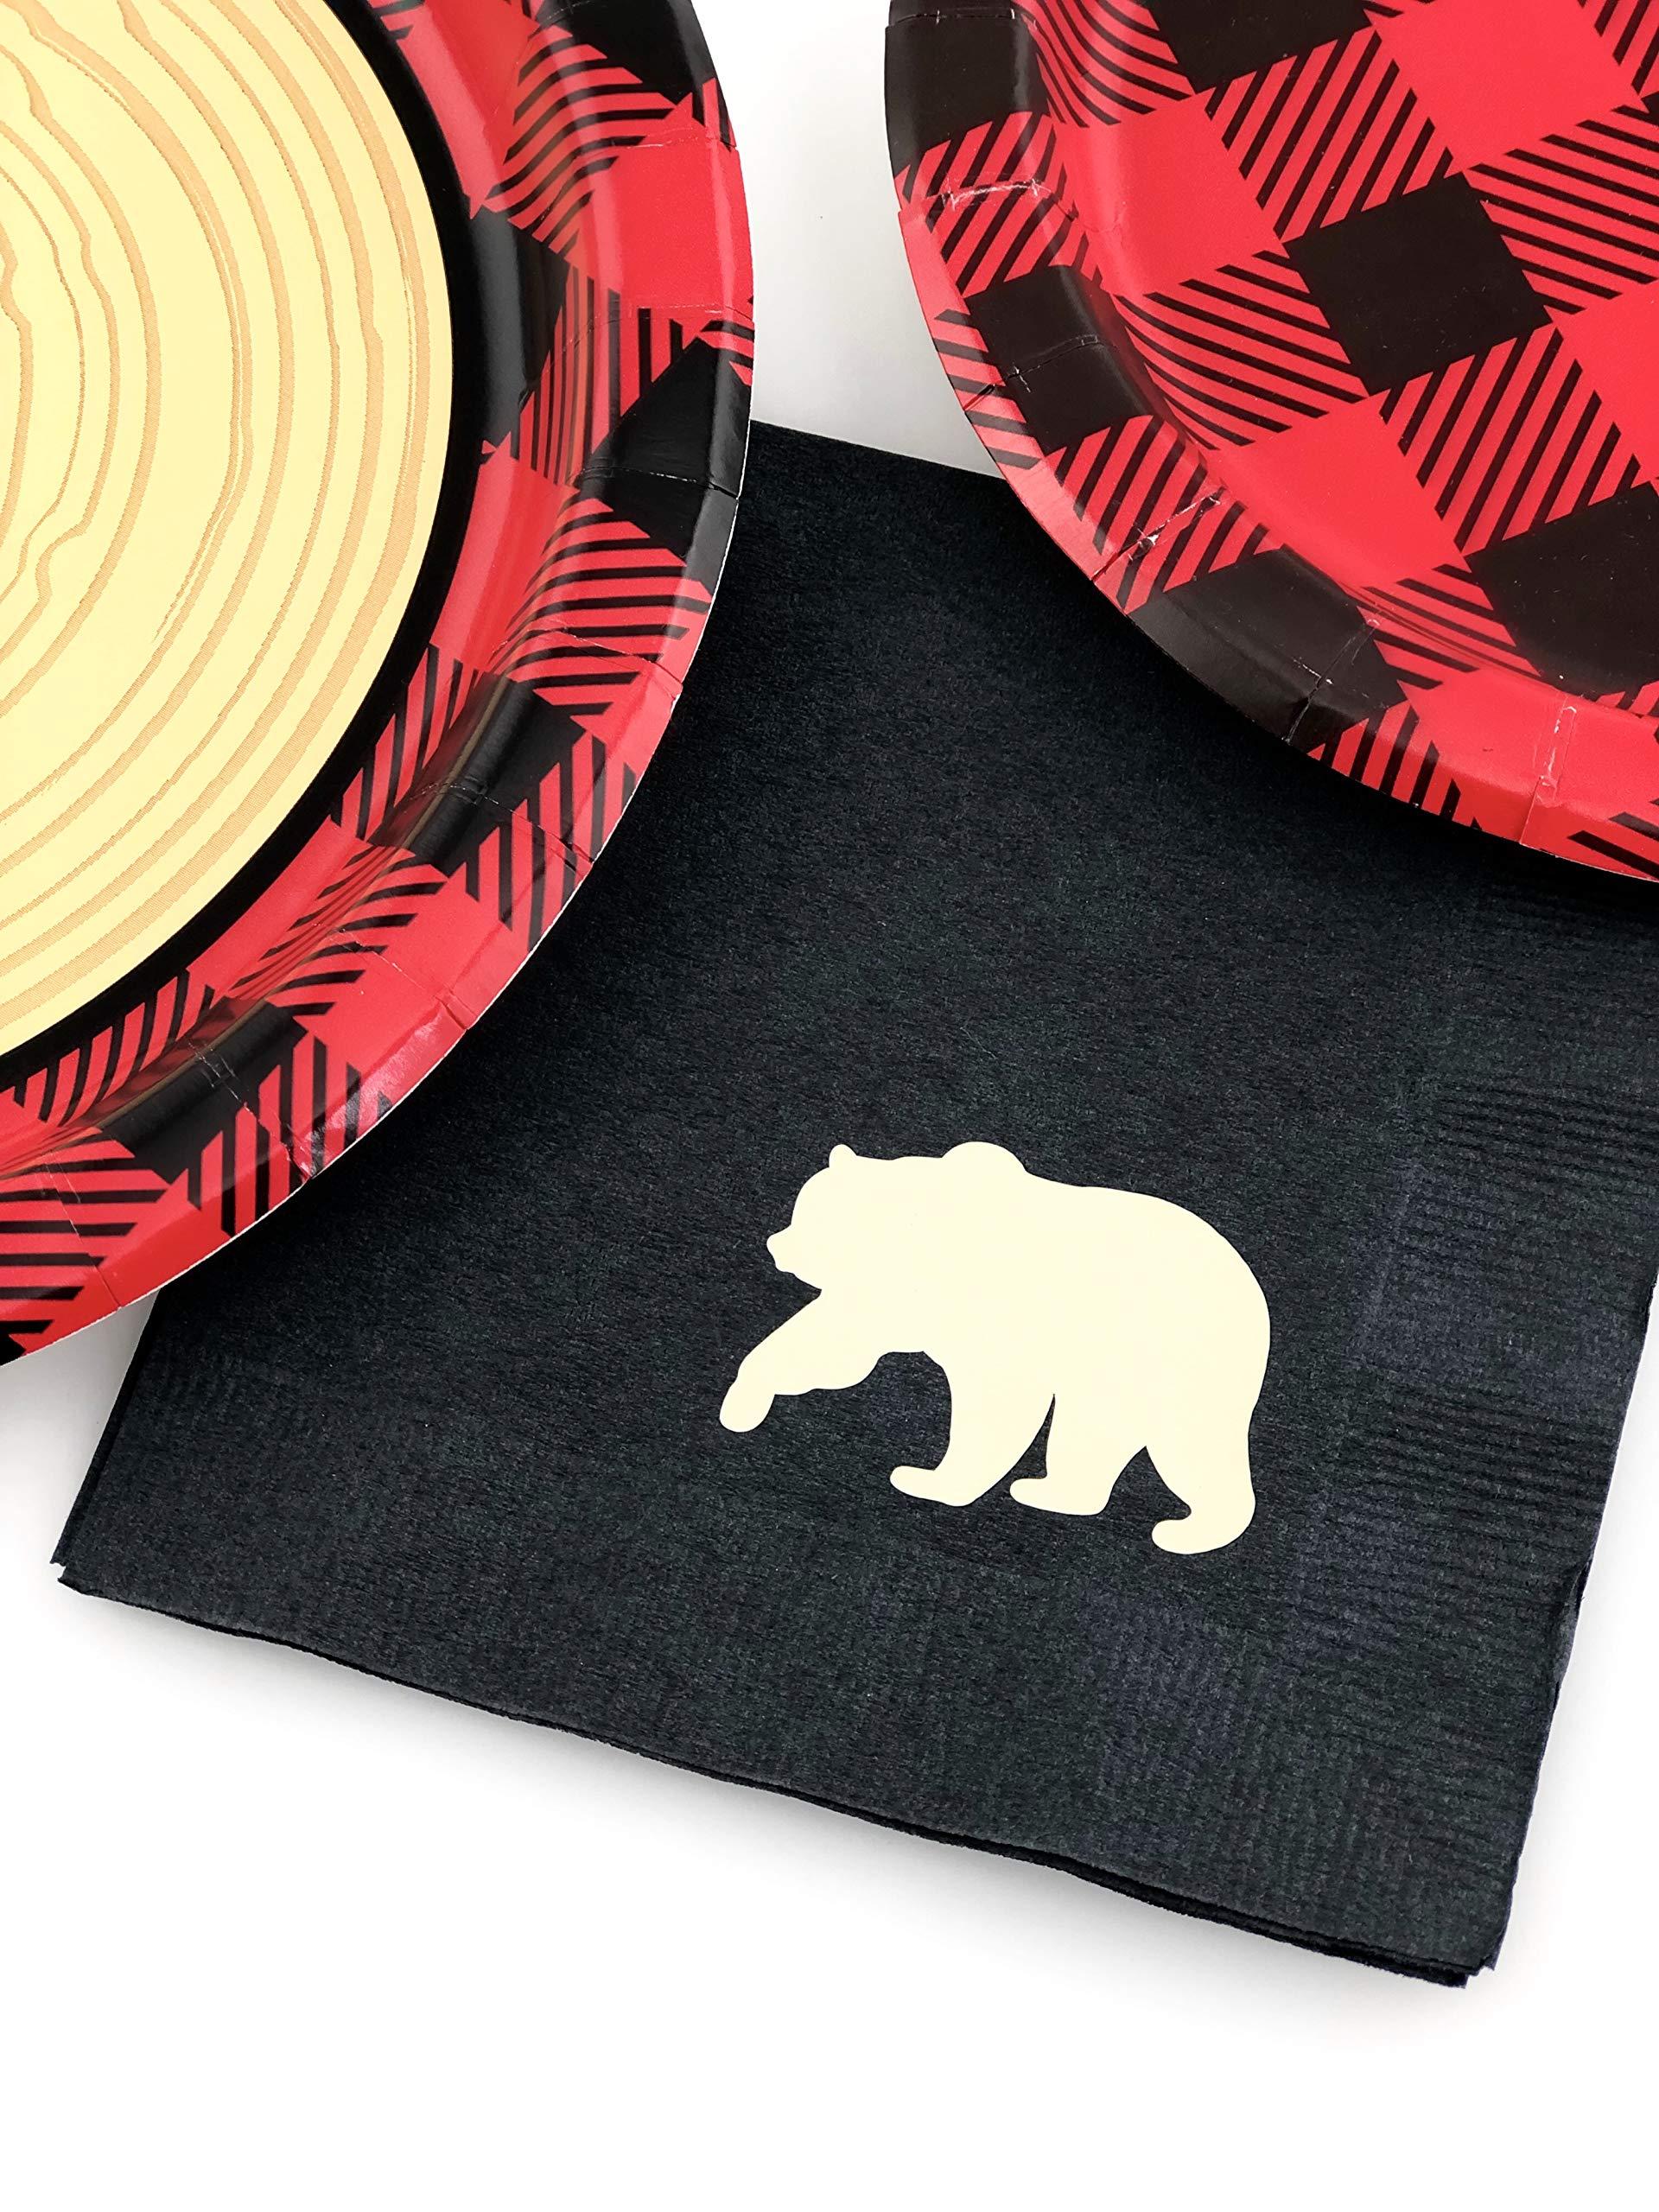 Buffalo Plaid Party Set - 16 Plates Napkins Lumberjack Birthday Bear Baby Shower by Stesha Party (Image #3)